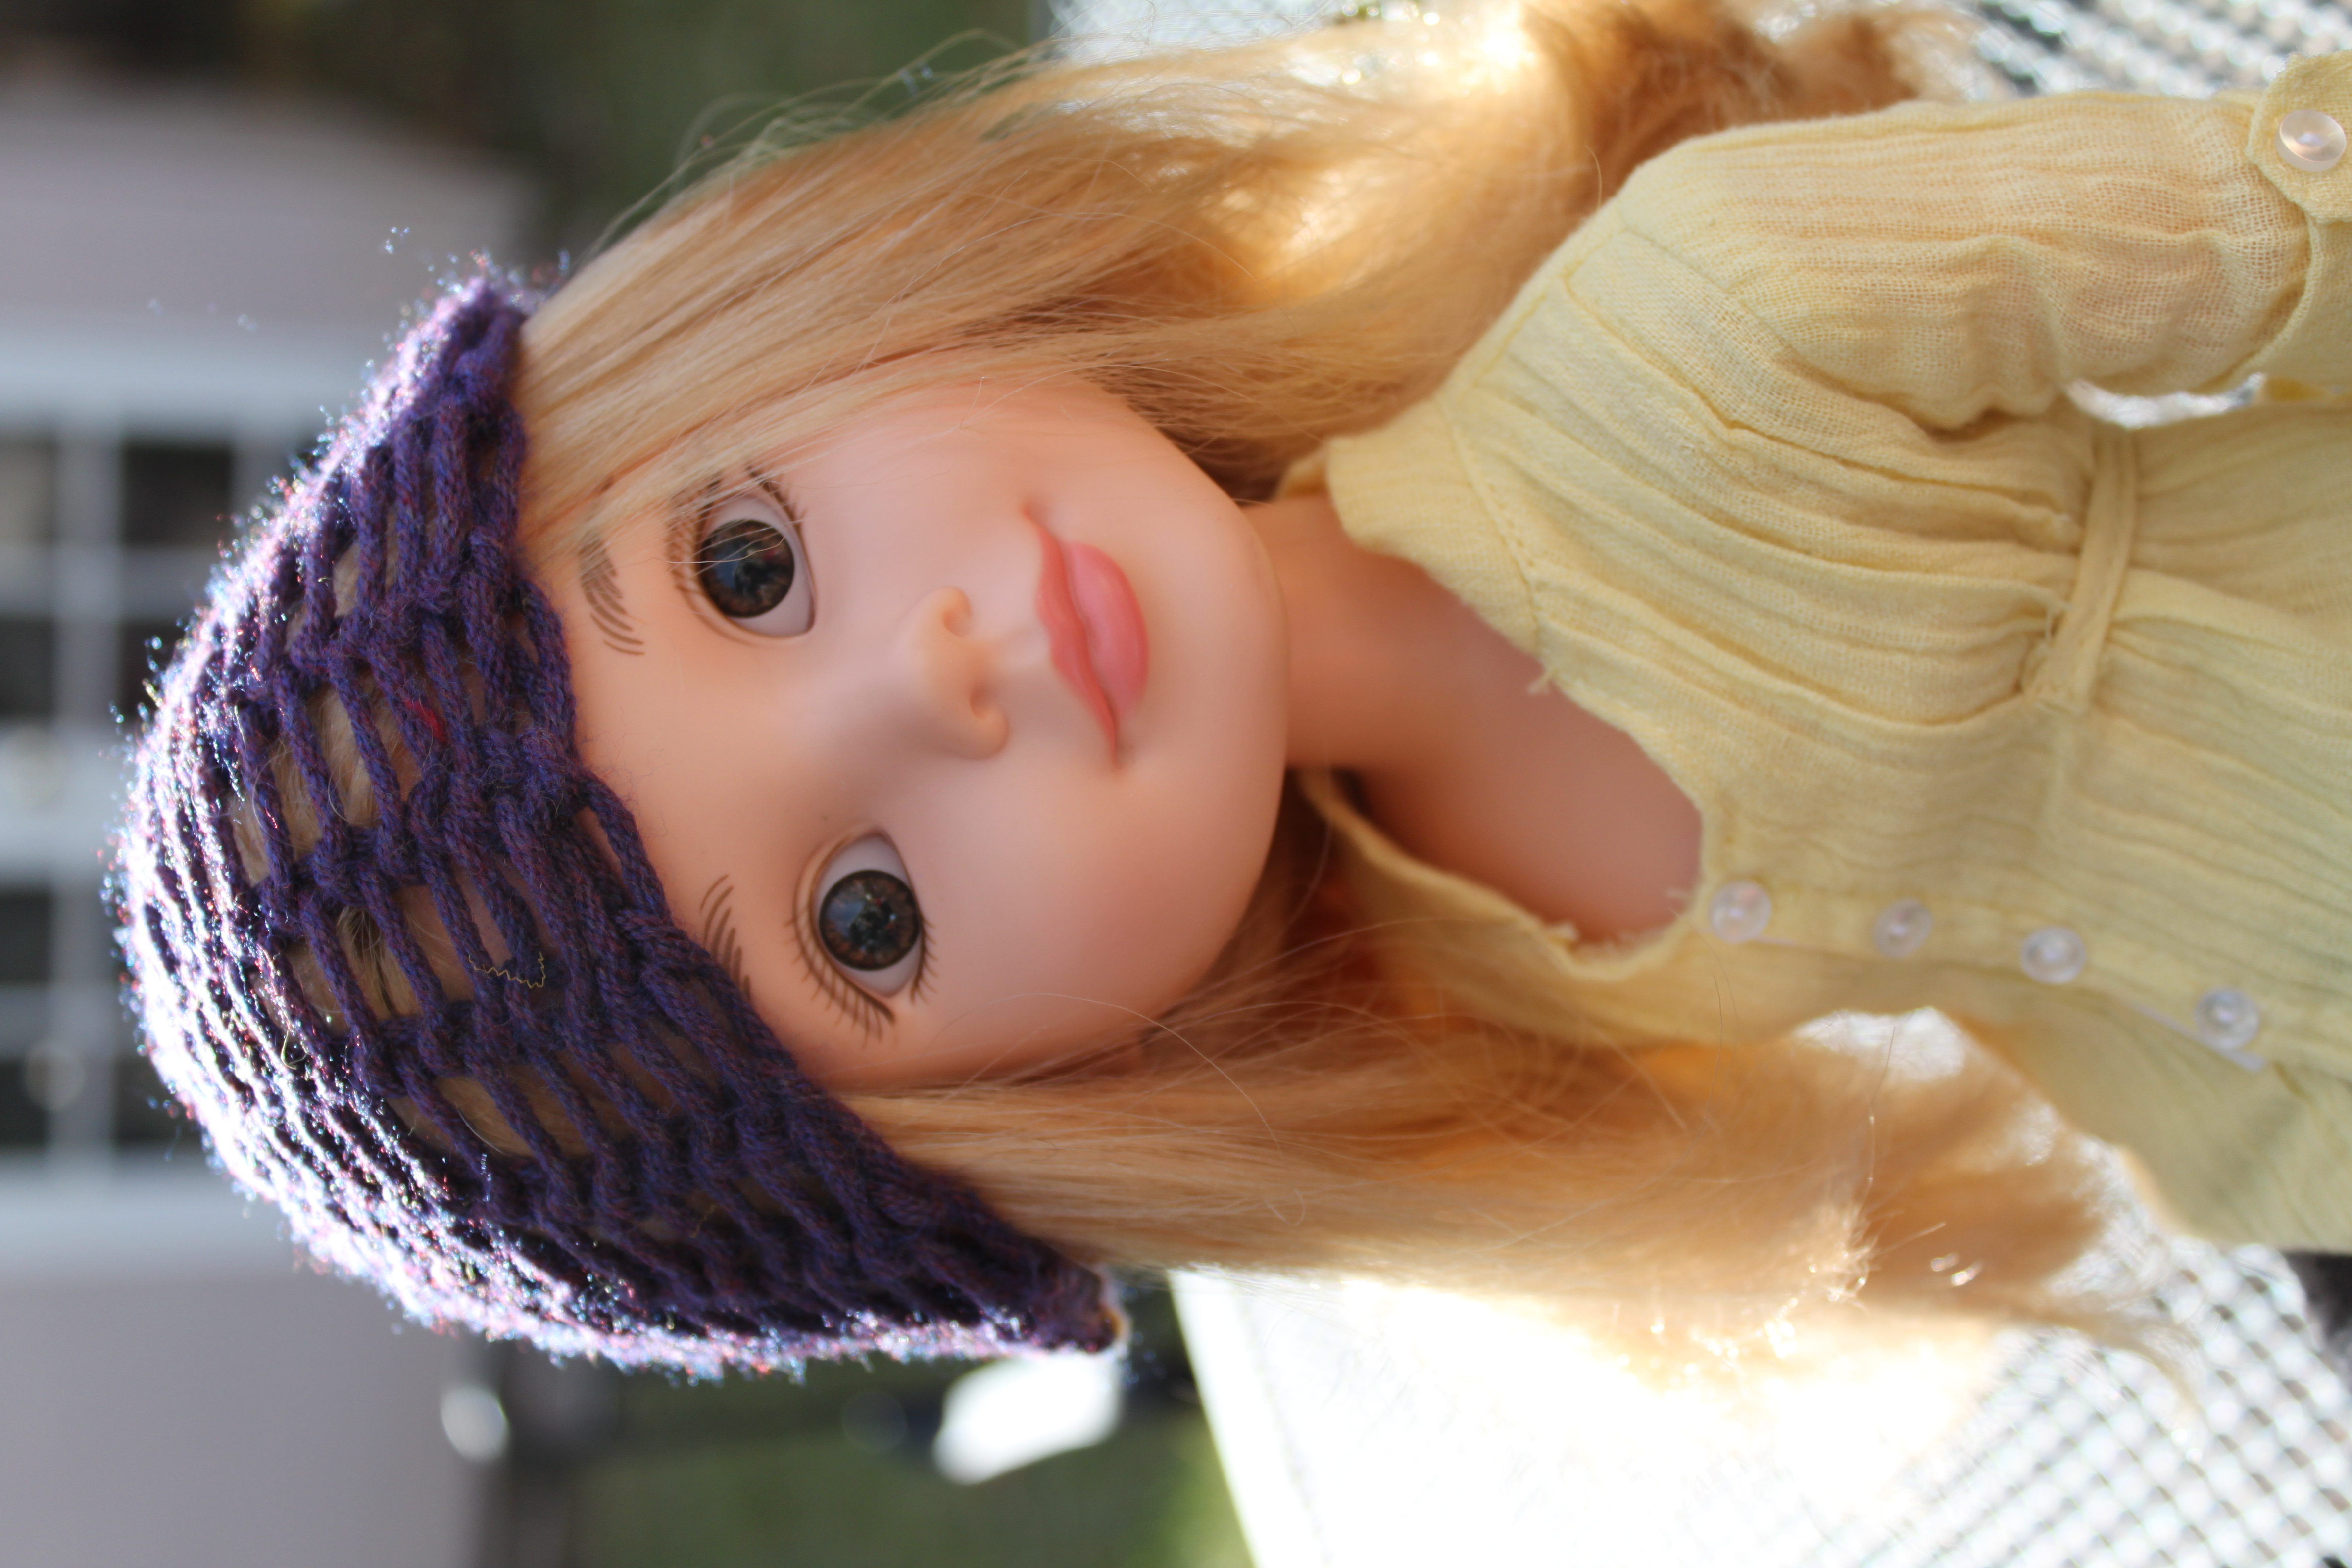 Knitting Nancy Toilet Paper Roll : Toilet paper roll knitting nancy idea chic winter doll